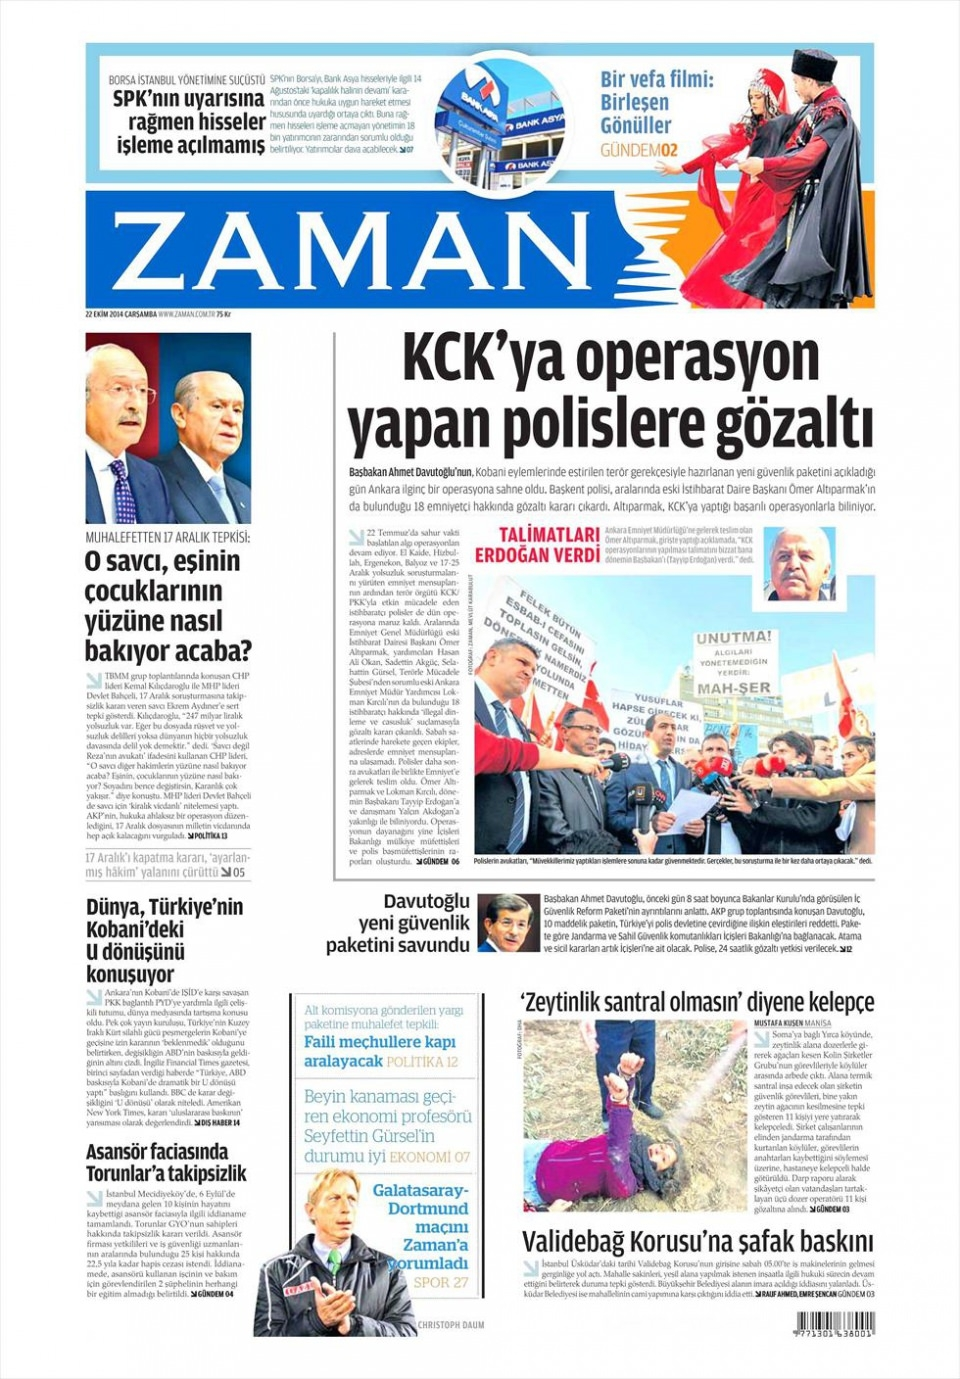 22 Ekim 2014 gazete manşetleri 25